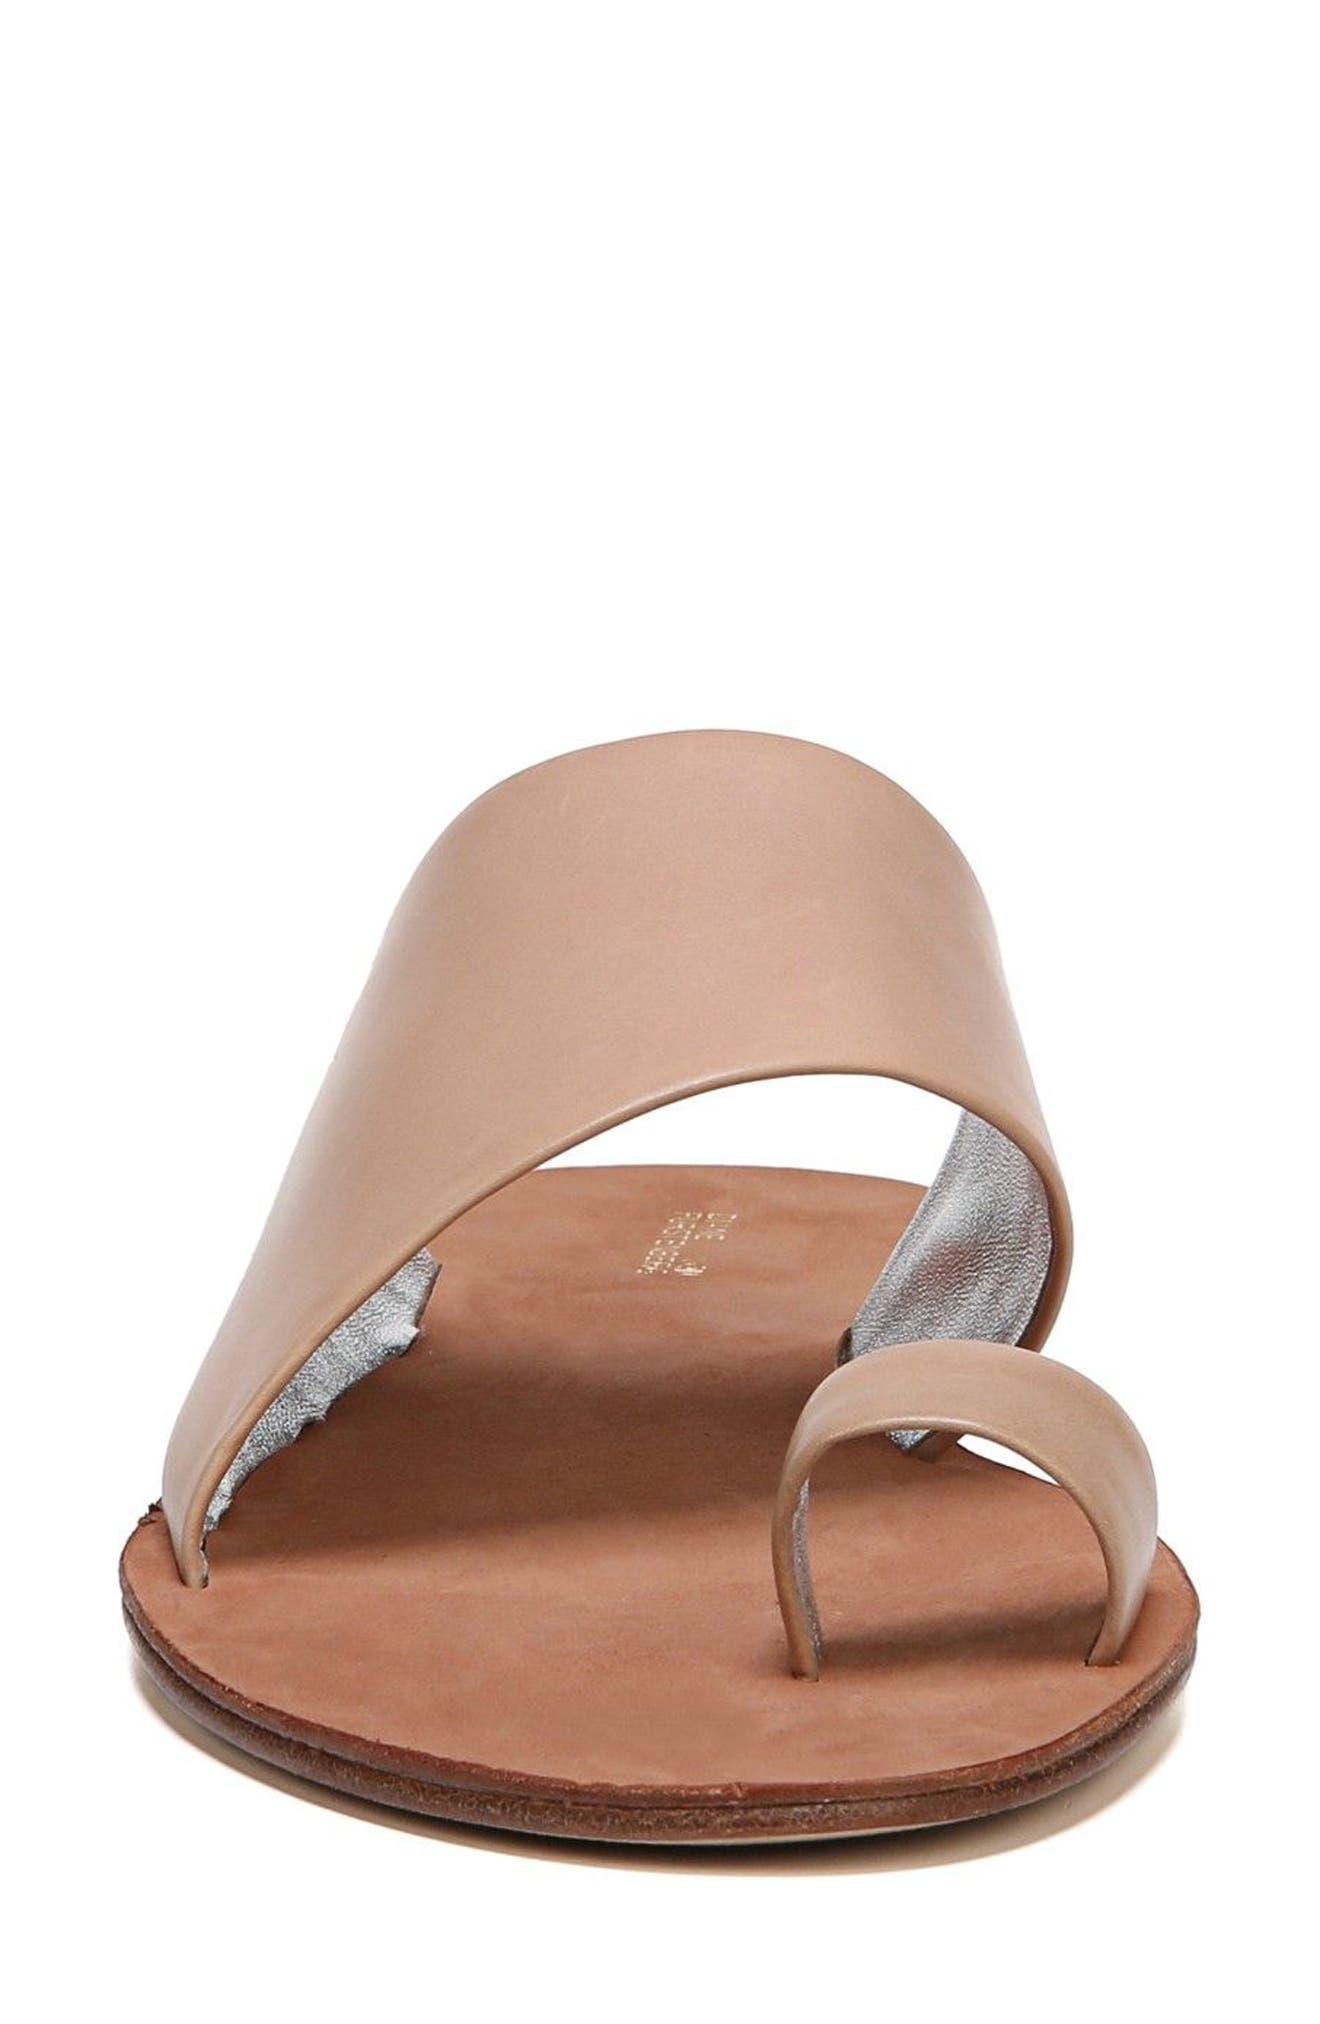 Brittany Asymmetrical Flat Sandal,                             Alternate thumbnail 4, color,                             202